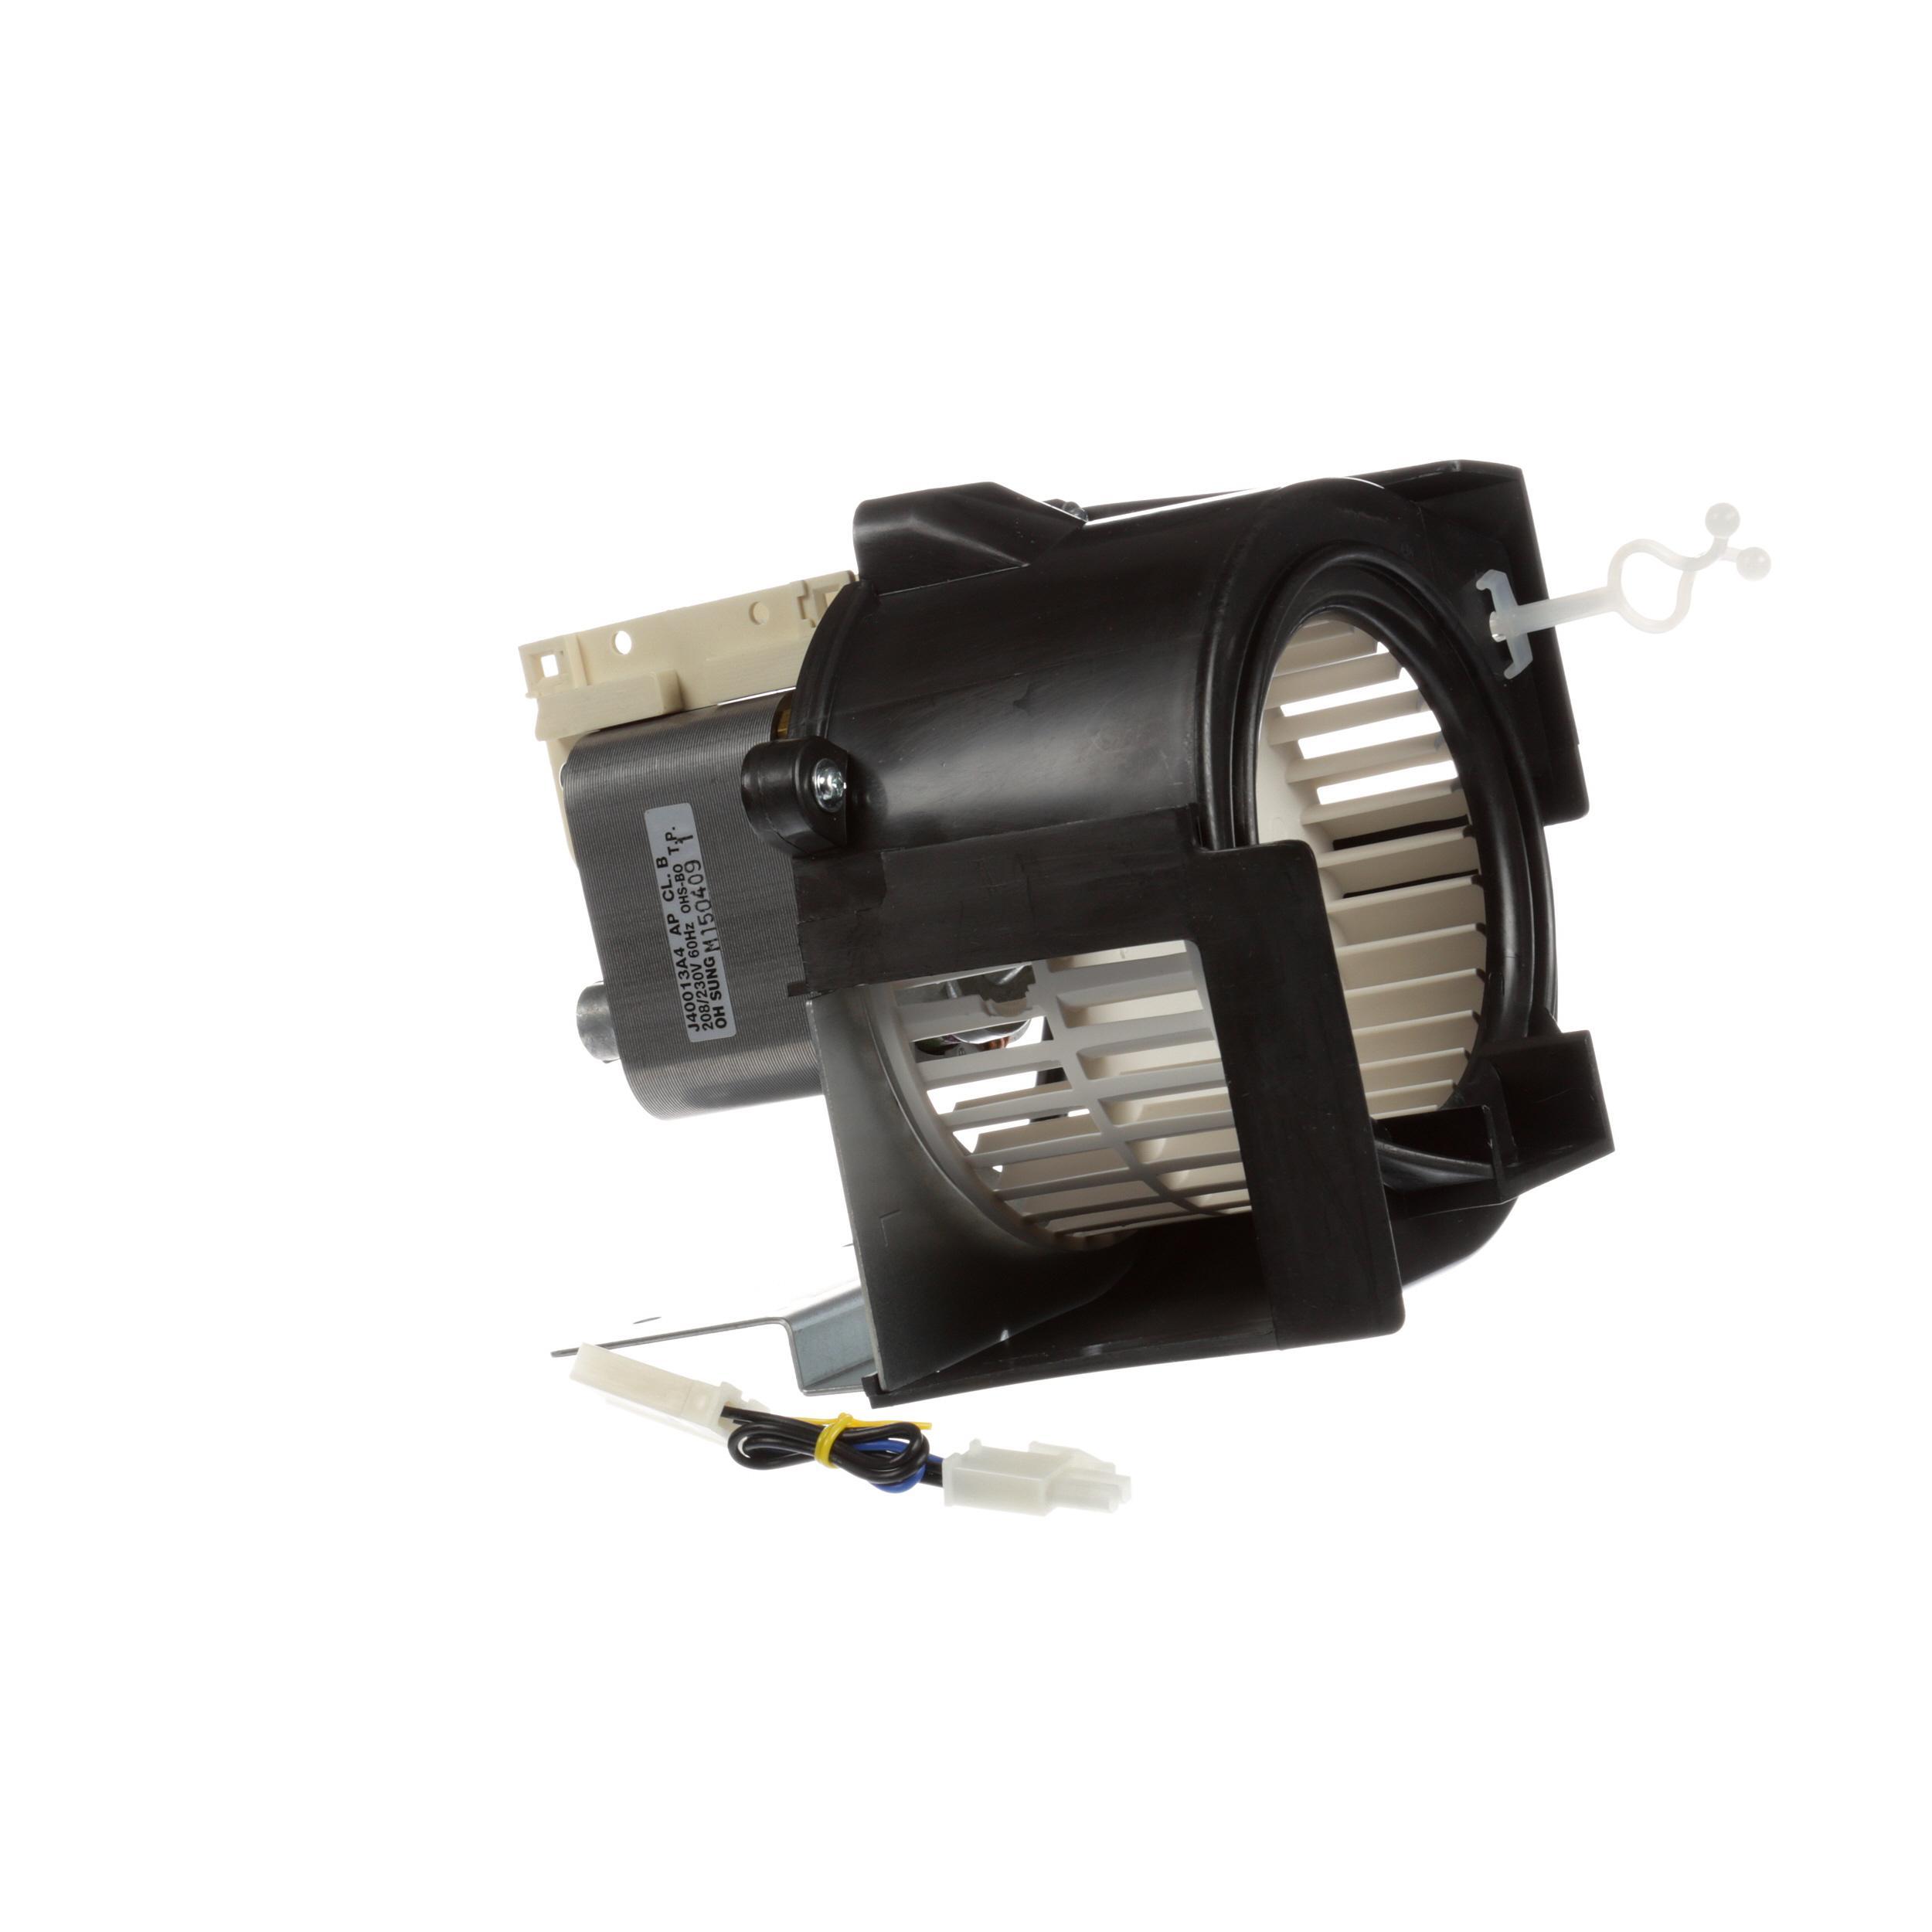 Panasonic Blower Motor Part A490w3570ap